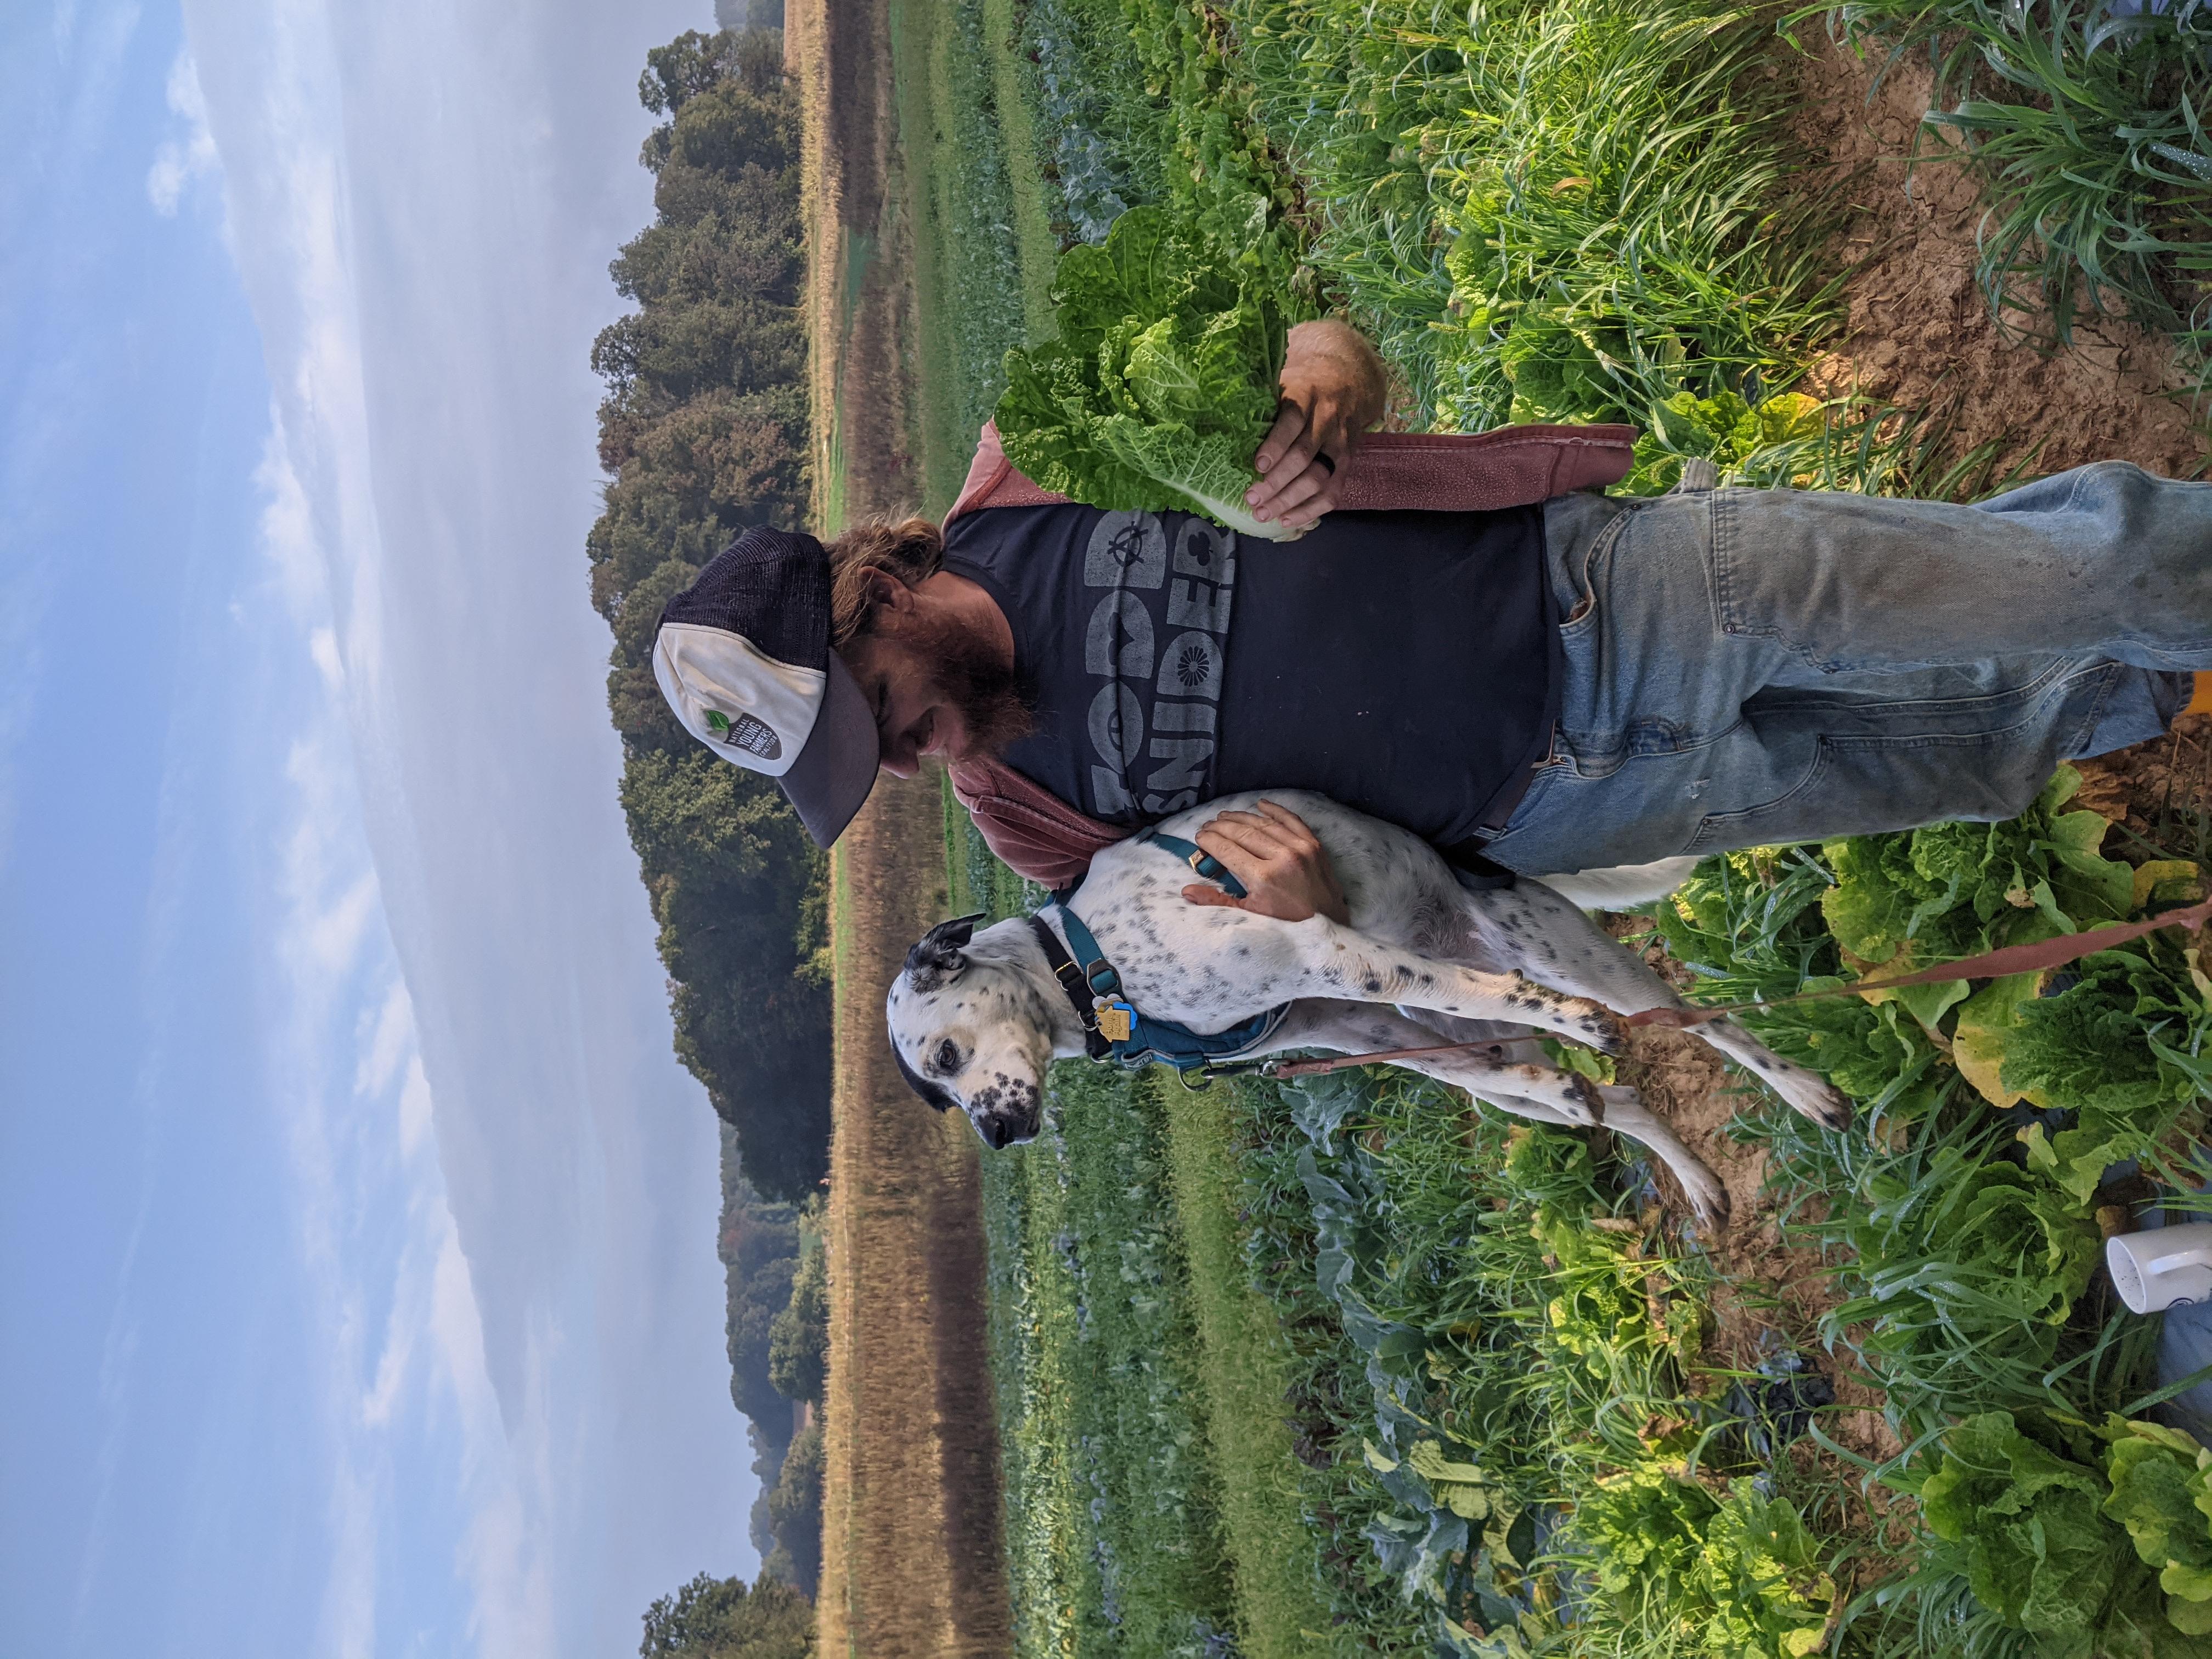 Farm Happenings for October 13, 2021